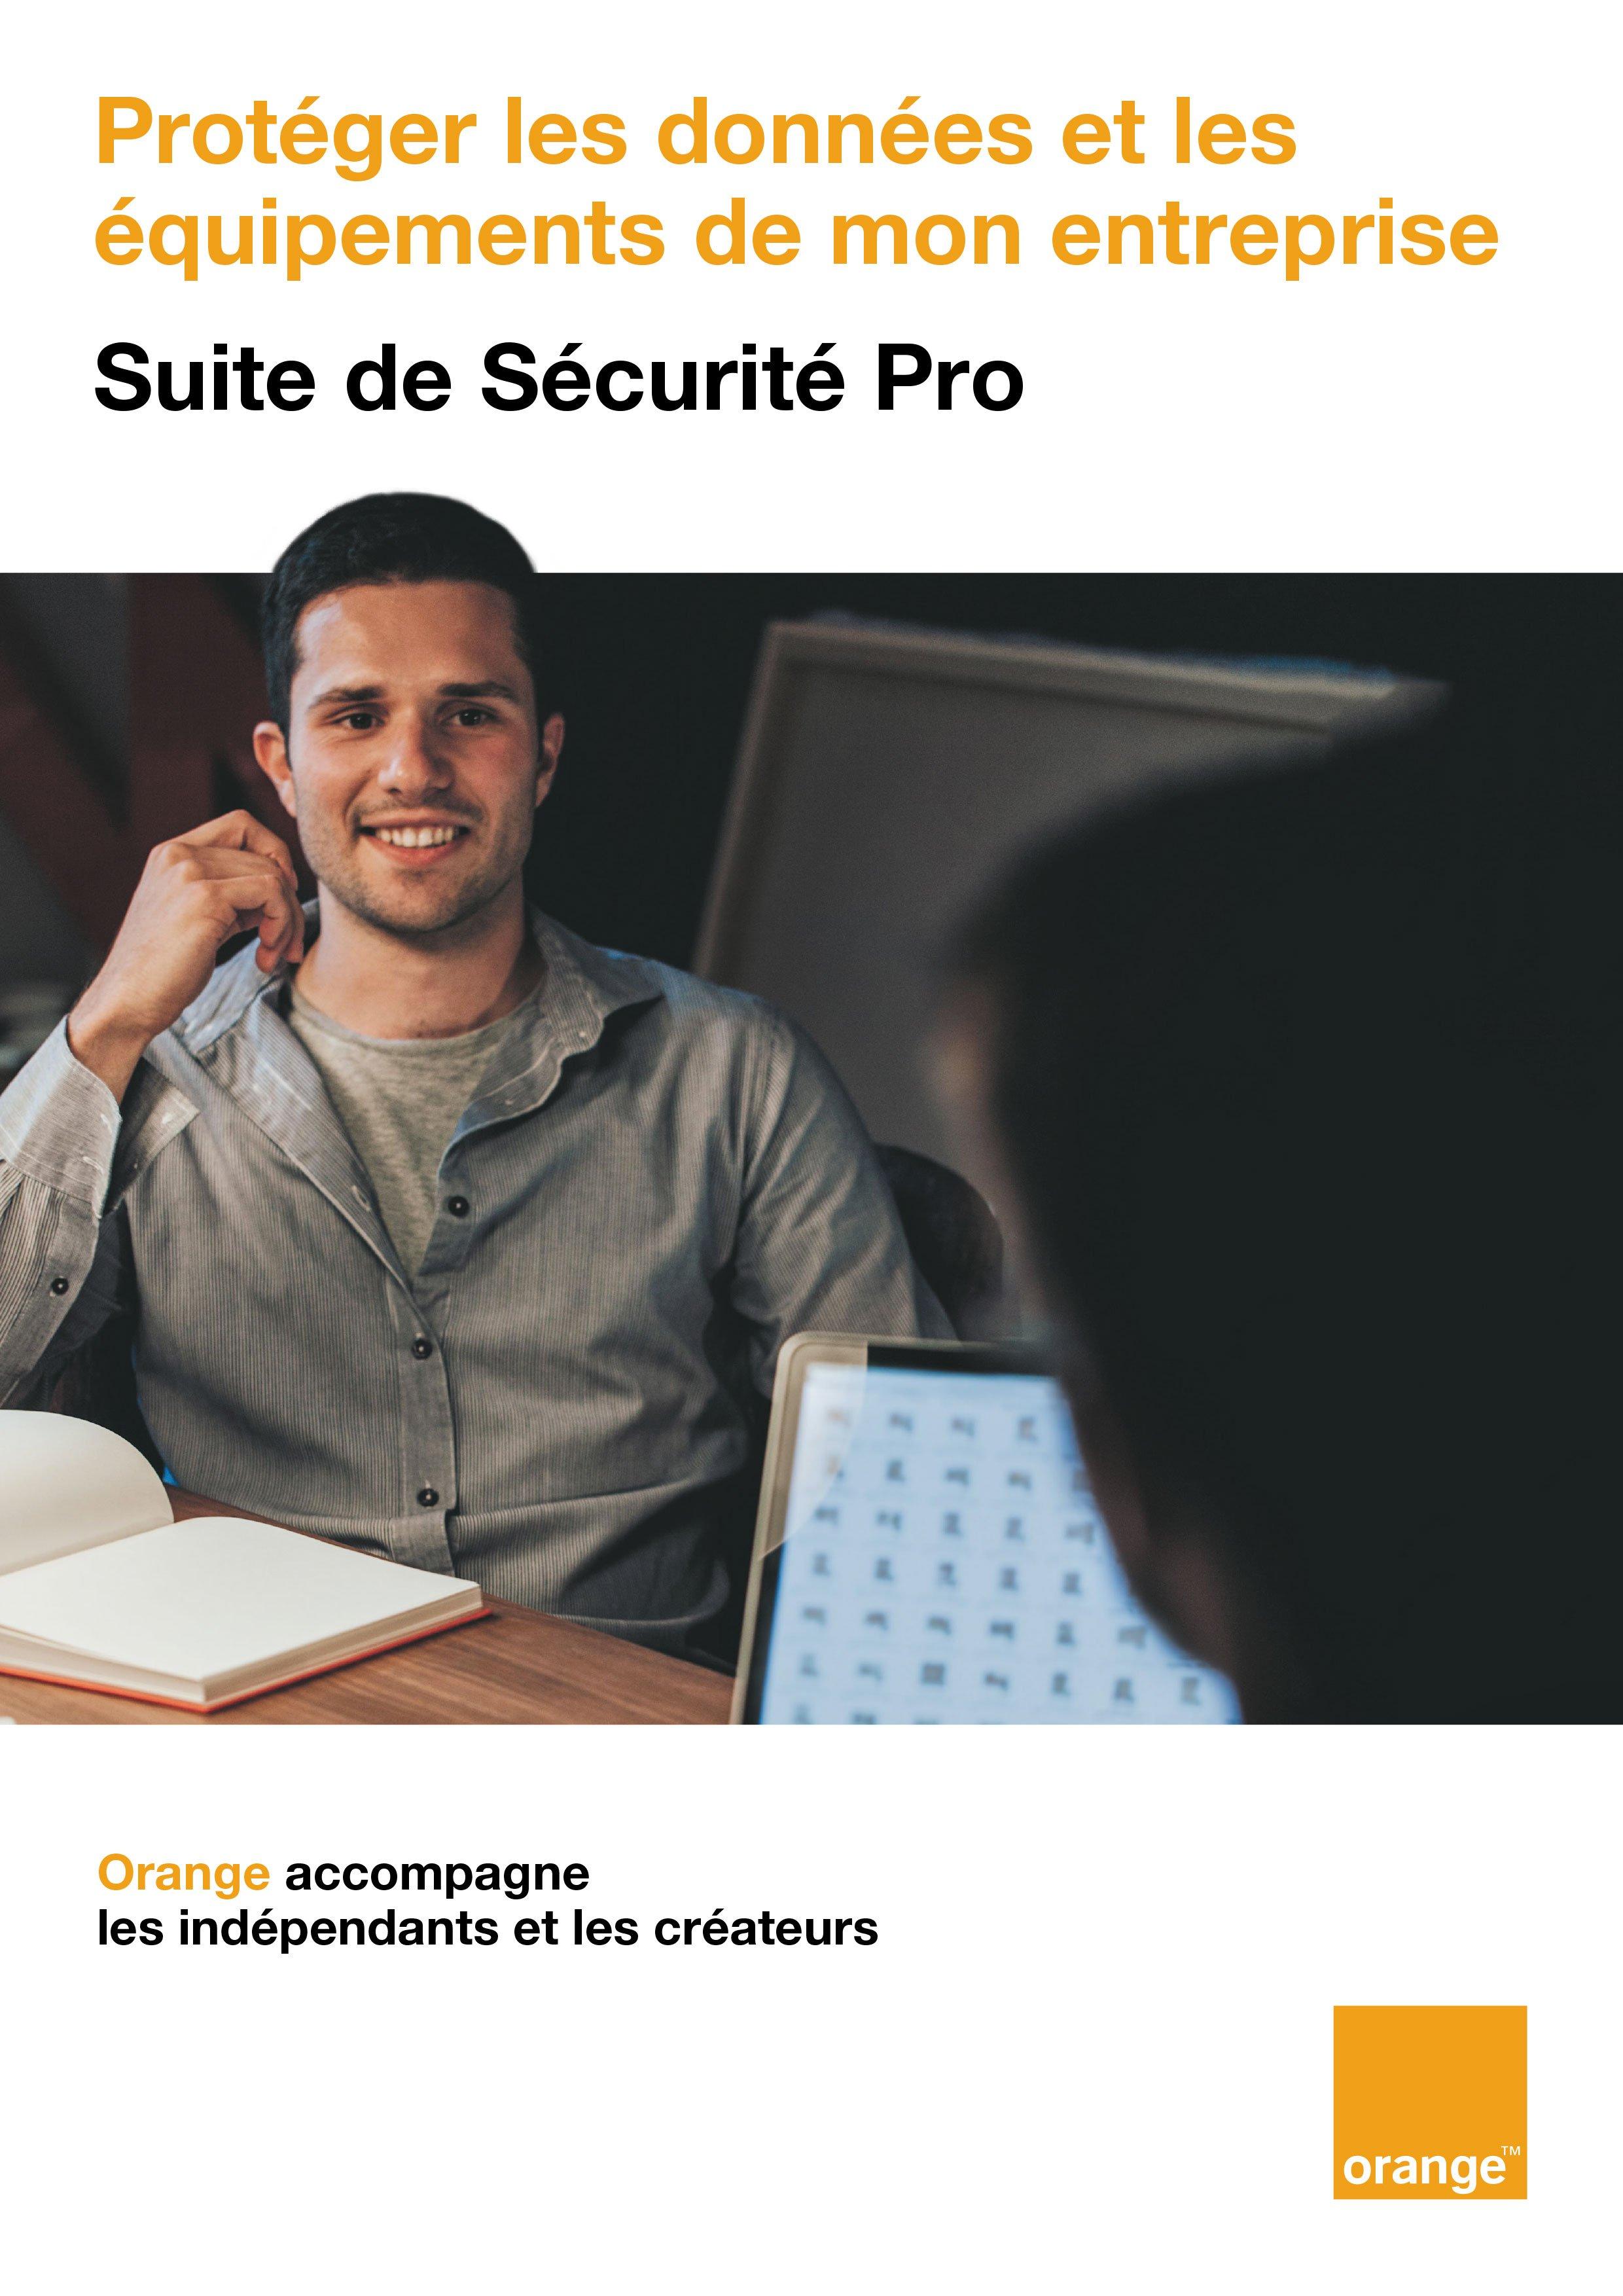 Fiche-Suite-de-securite_A4_0118-1.jpg